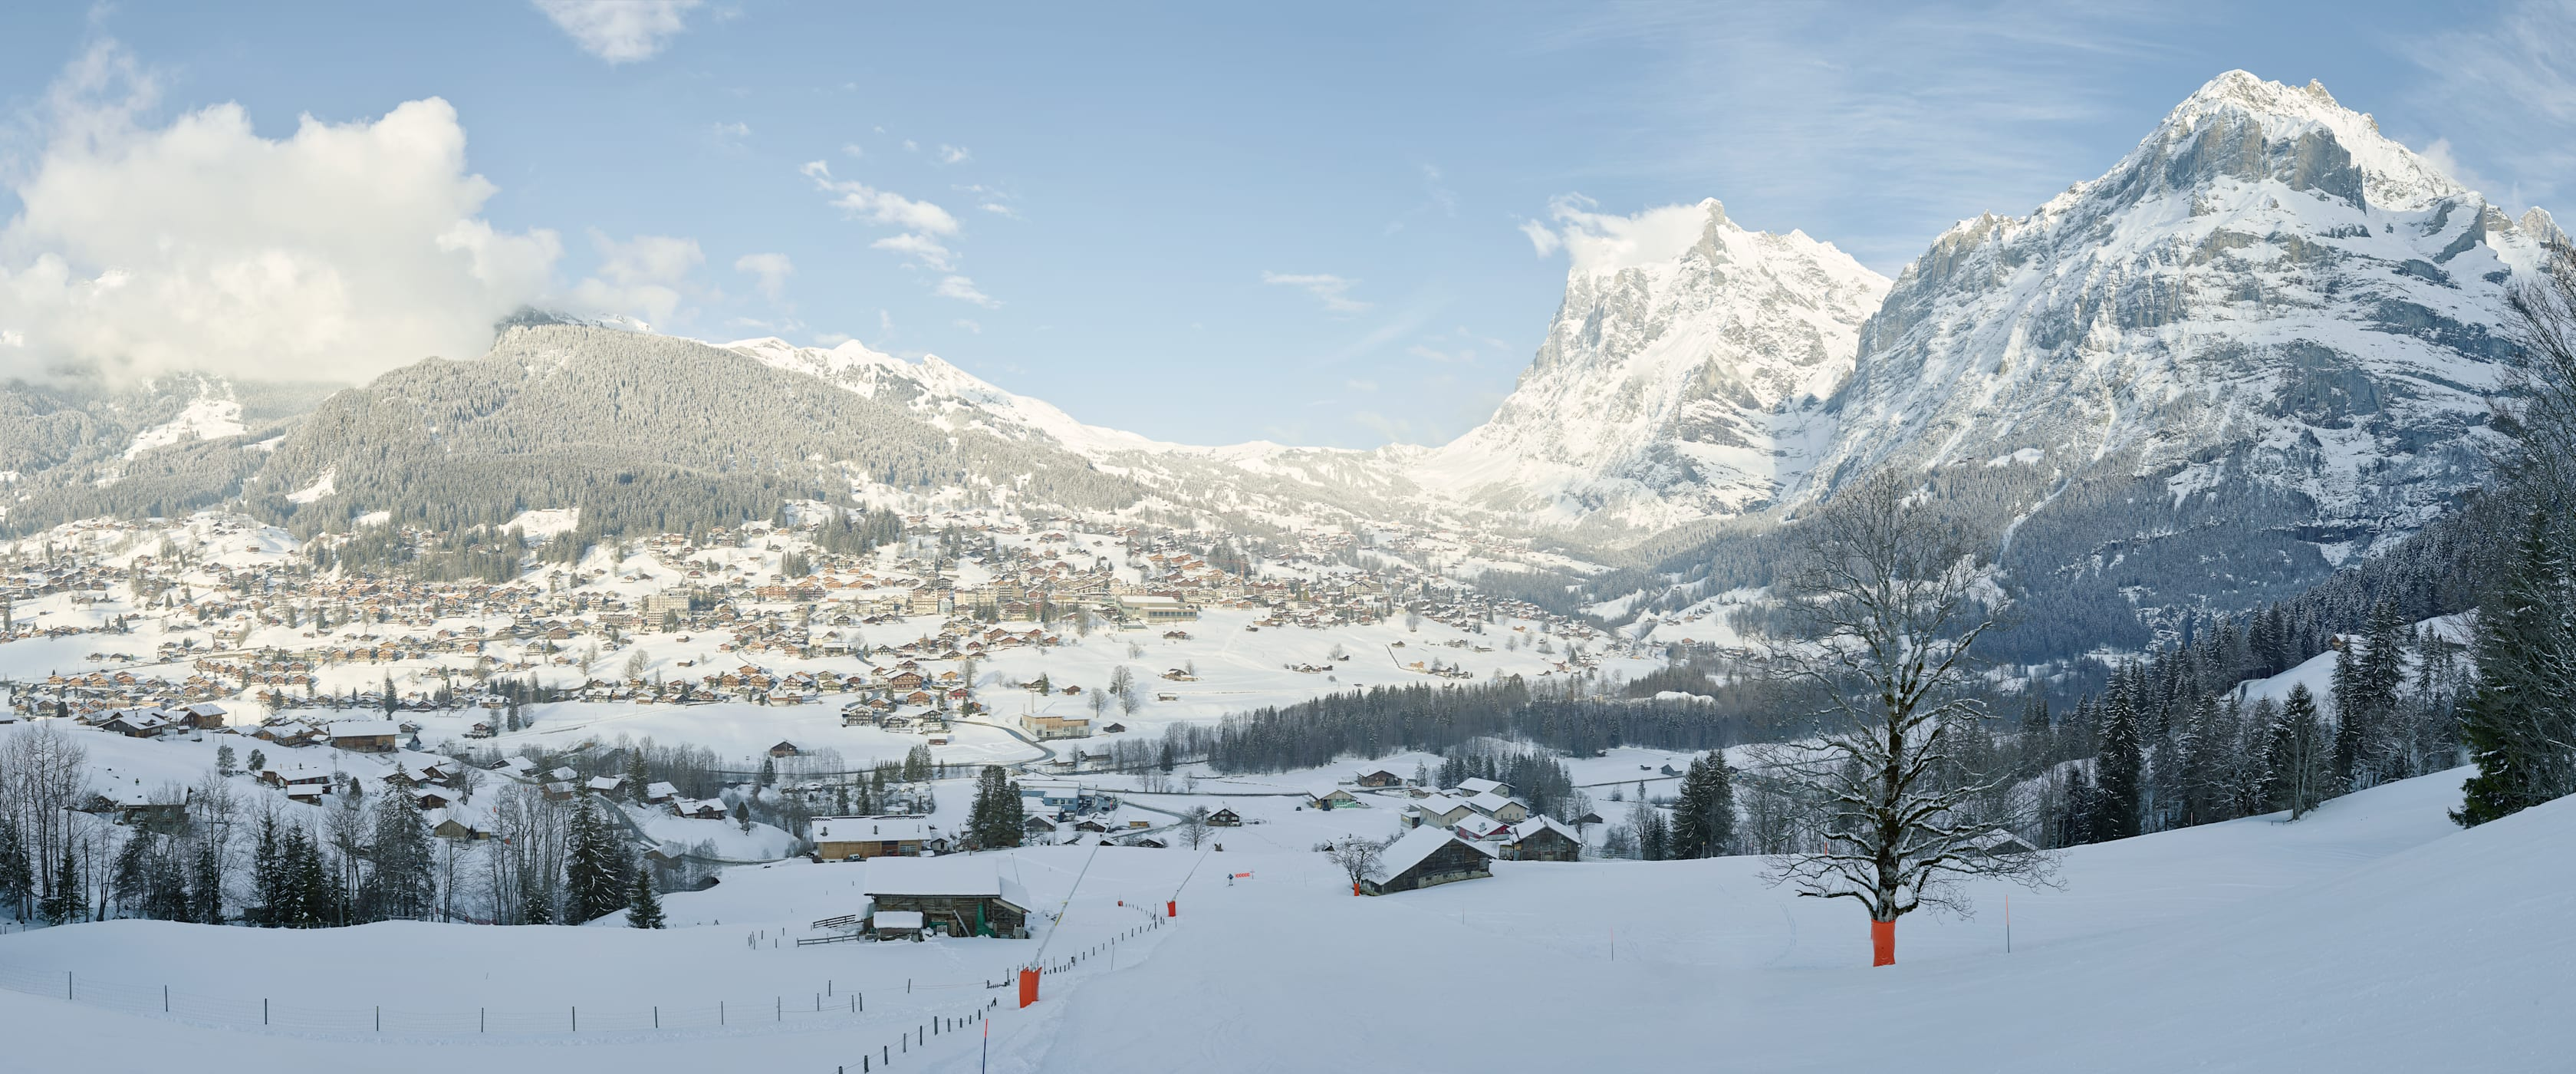 Grindelwald Winter Wetterhorn Mattenberg